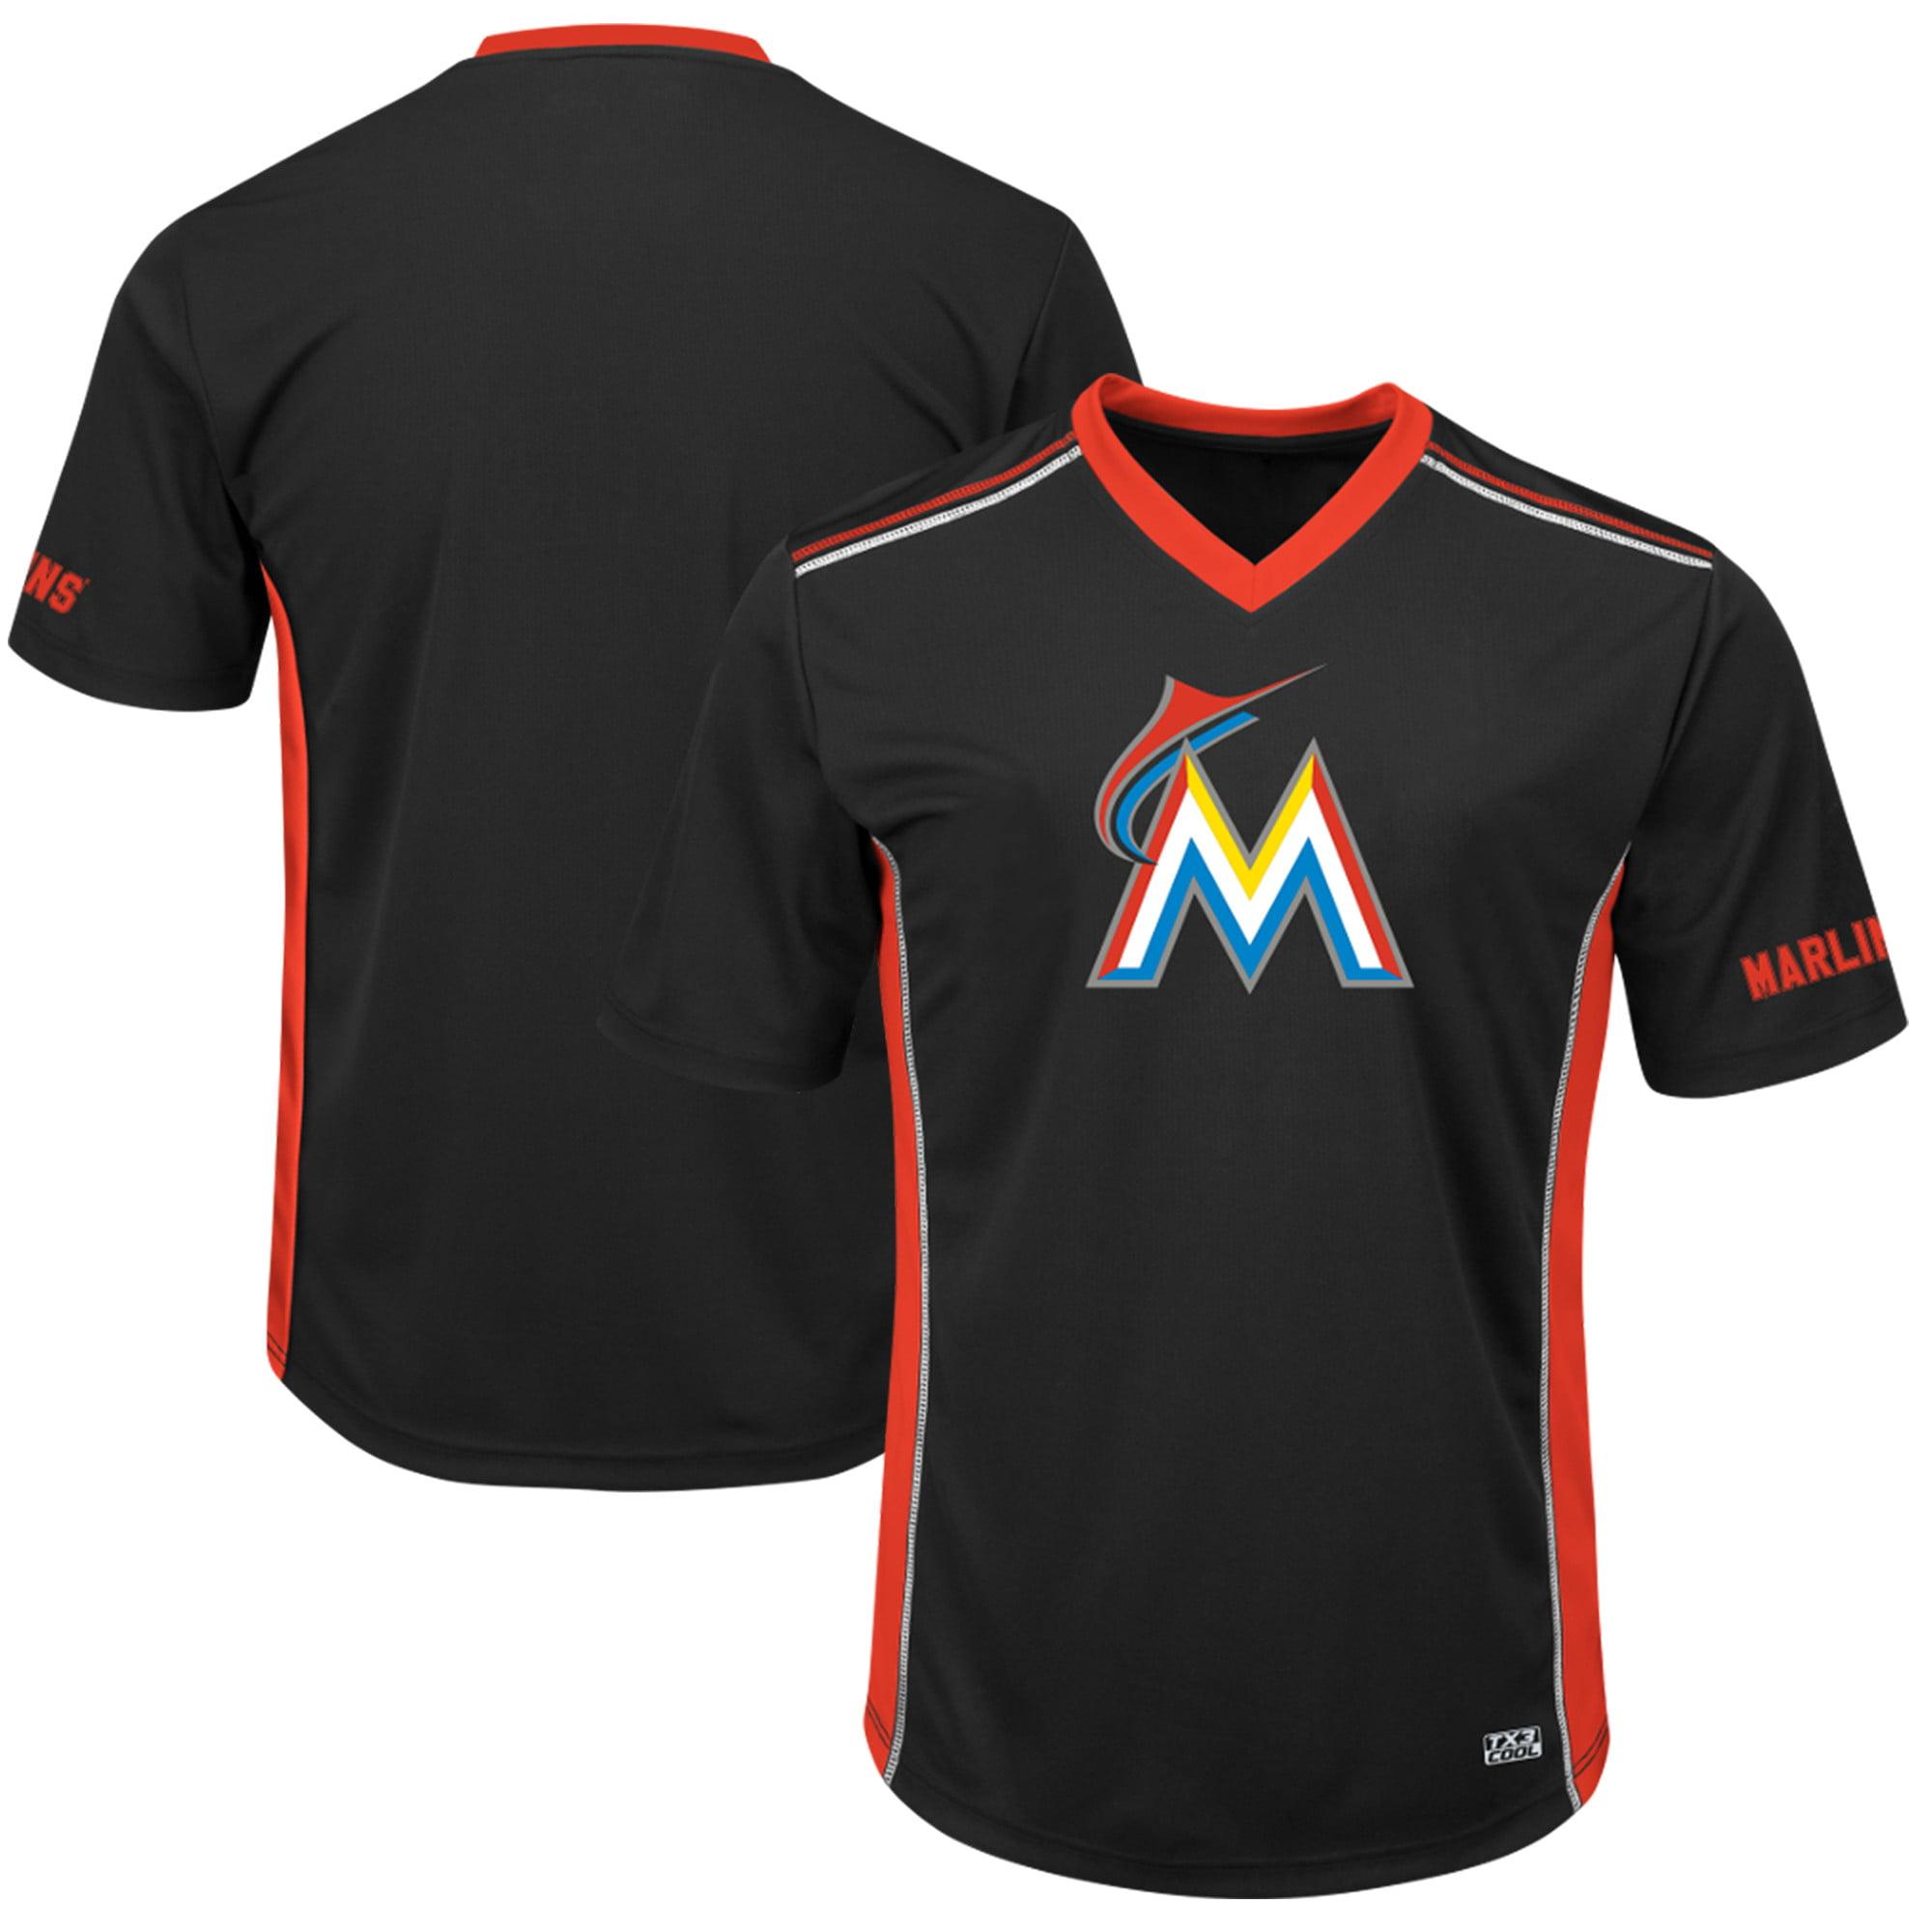 Men's Majestic Black/Red Miami Marlins Big & Tall Memorable Moments T-Shirt